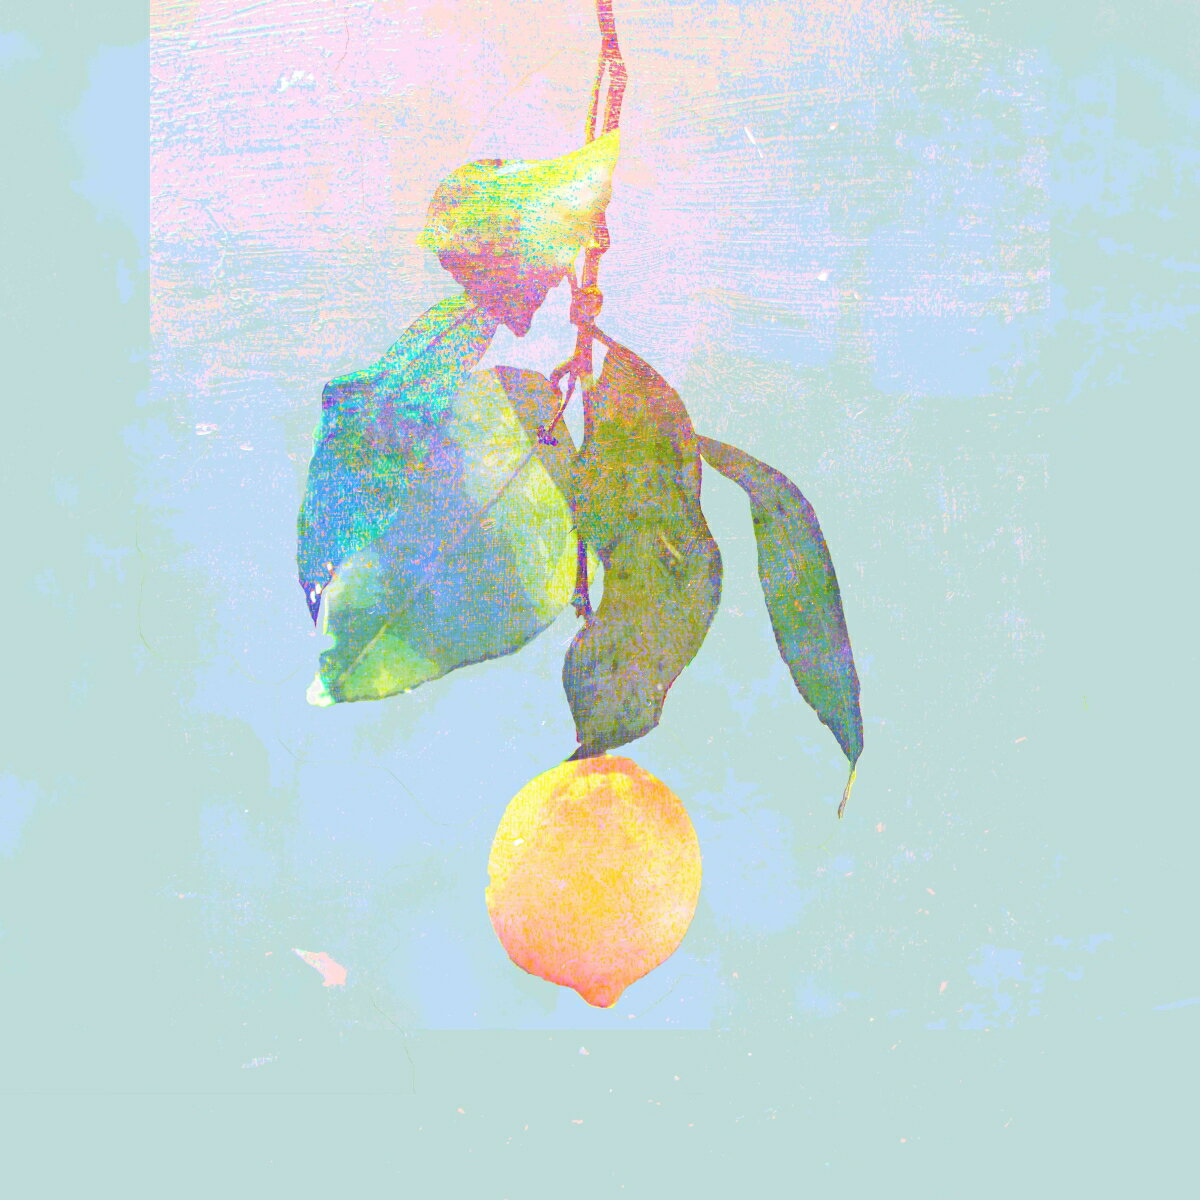 Lemon (初回限定レモン盤 CD+レターセット) [ 米津玄師 ]